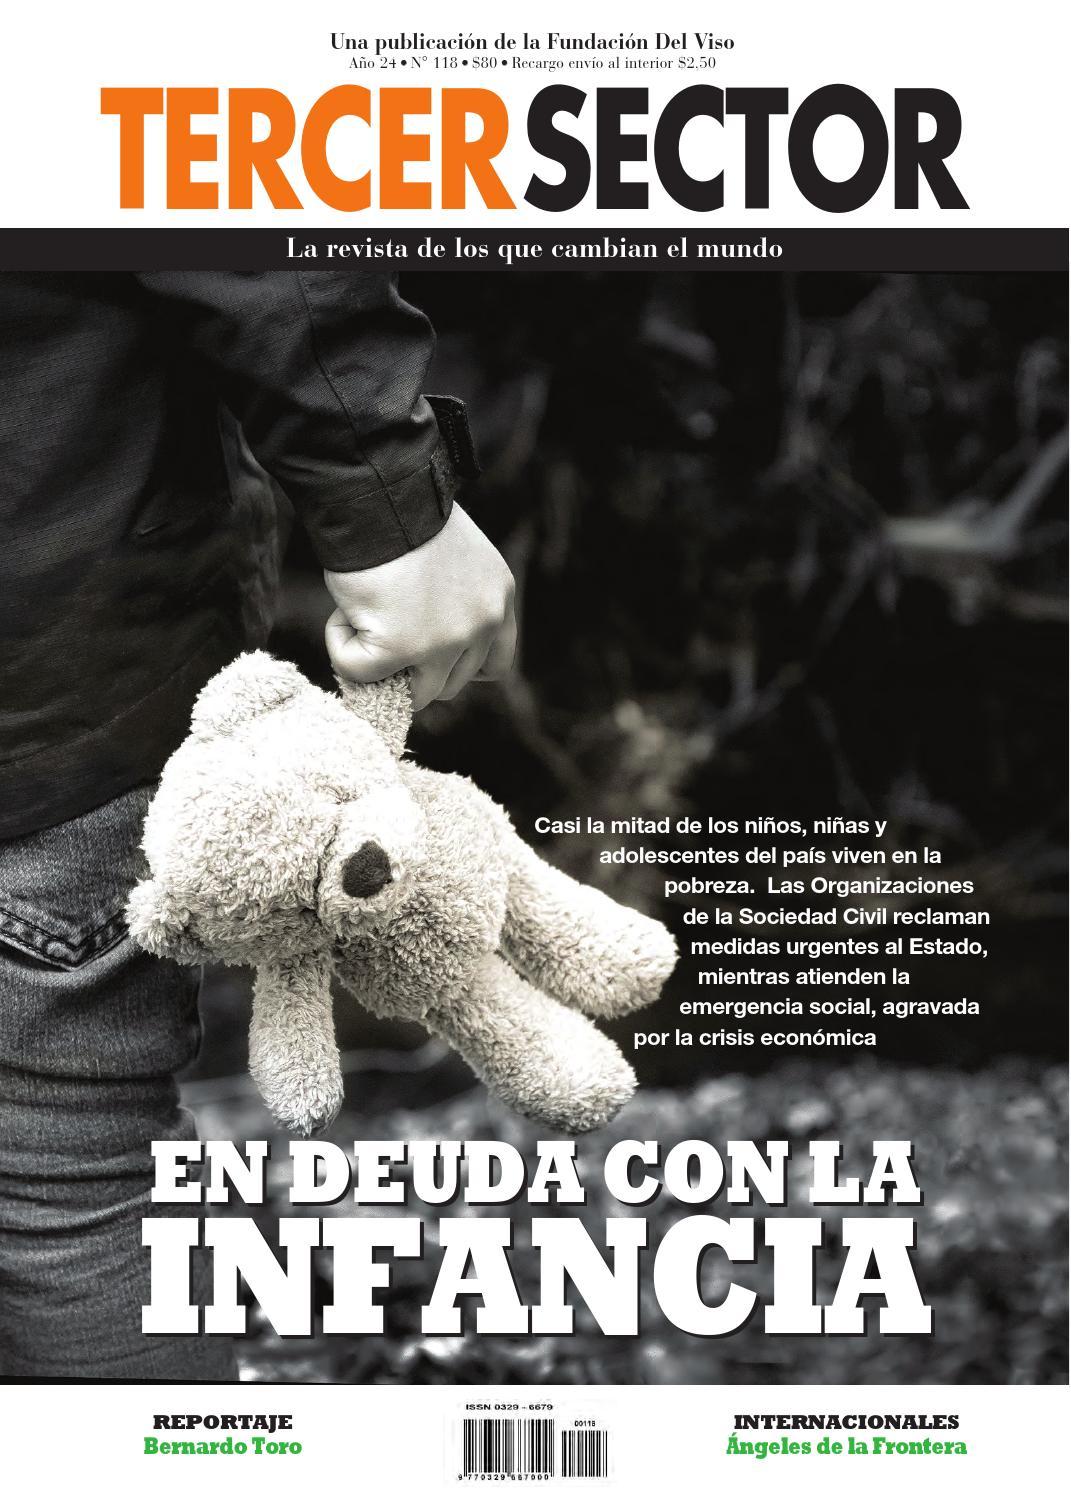 e8696ccf310f8 Revista Tercer Sector Edición 118 by Tercer Sector - issuu